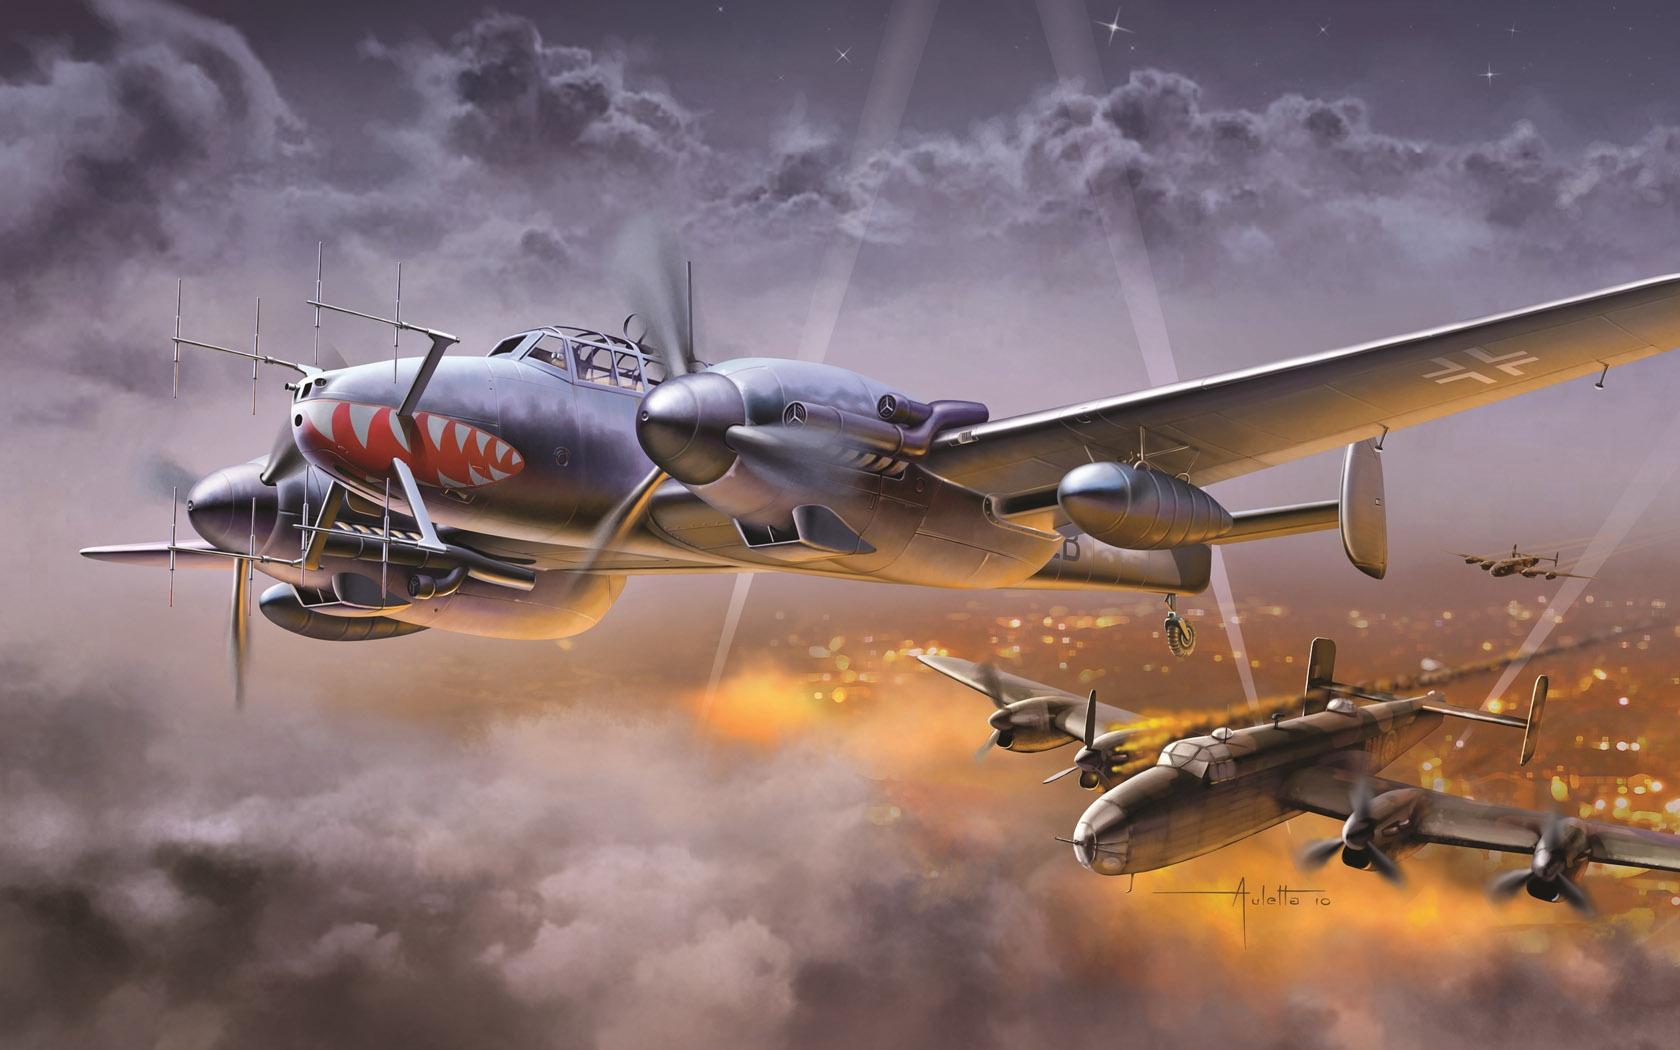 рисунок Bf-110 сбил британский бомбардировщик